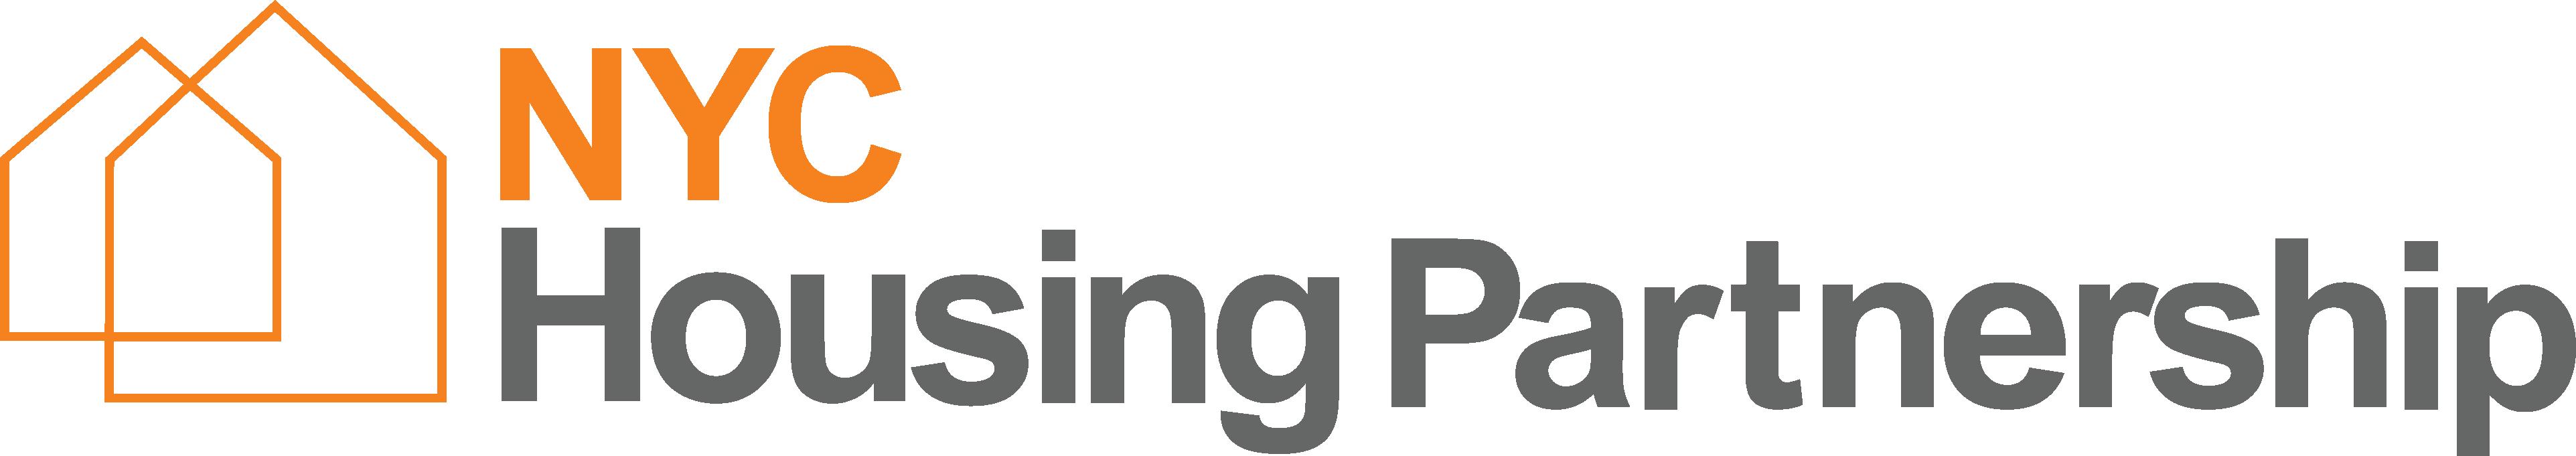 NYC Housing Partnership